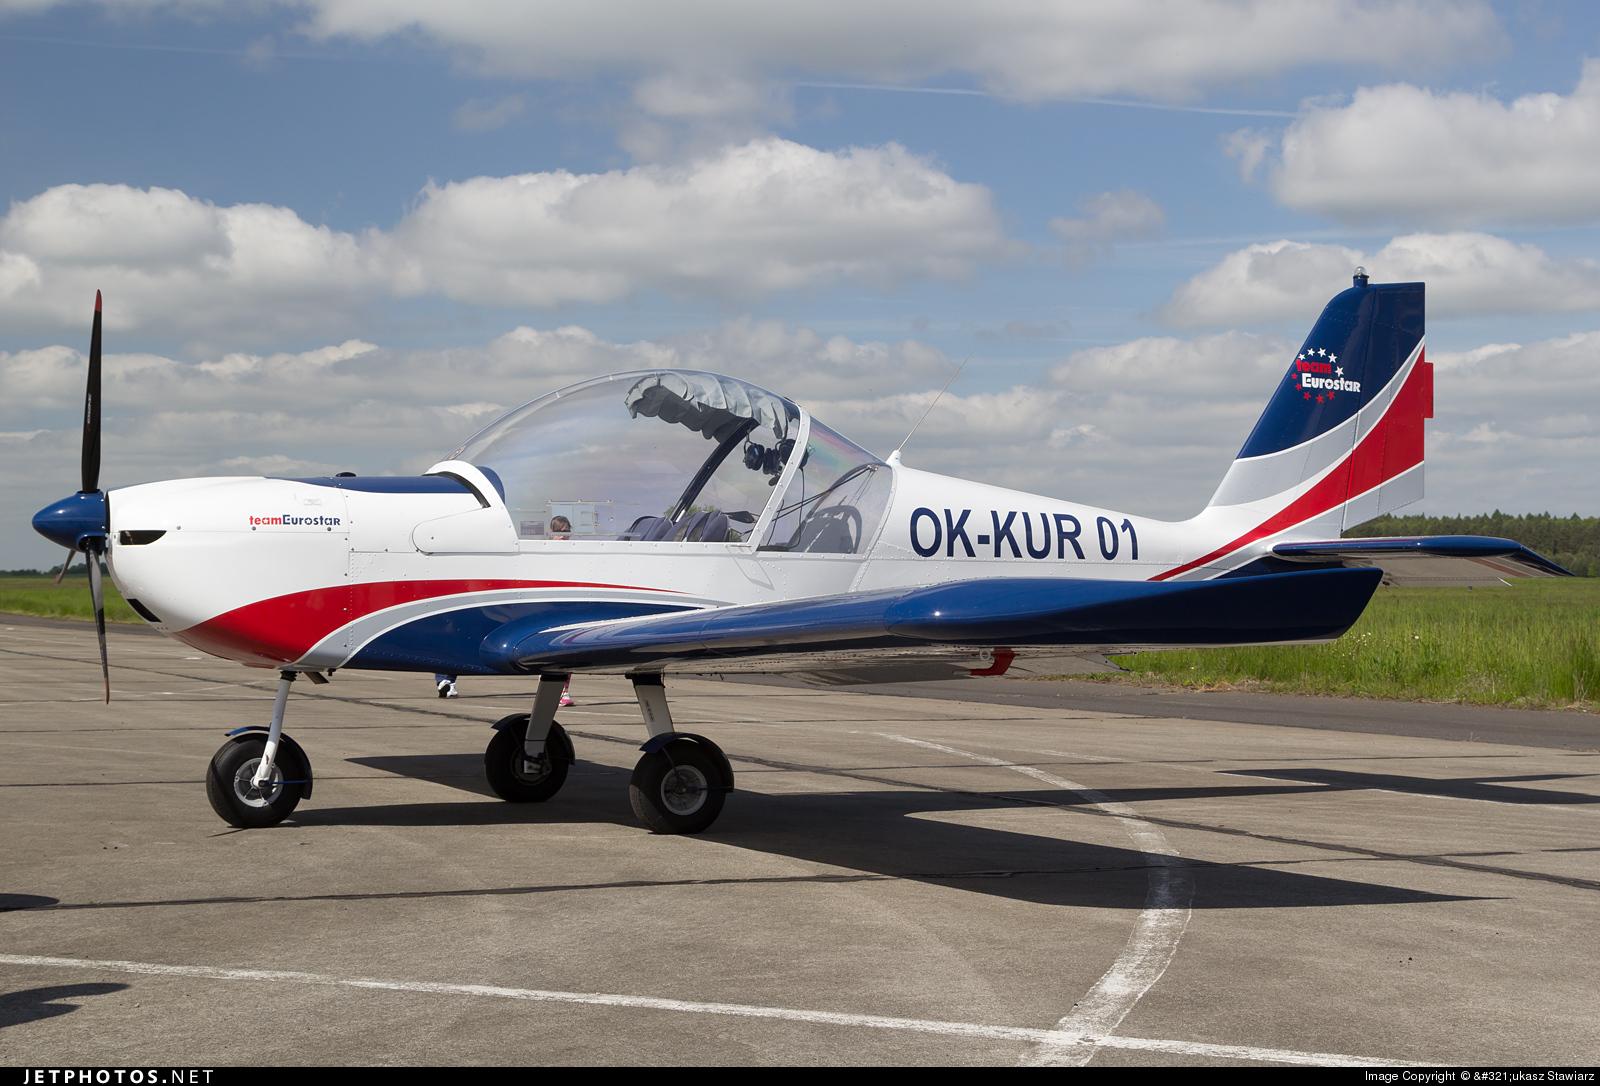 OK-KUR01 - Evektor-Aerotechnik EV97 Eurostar - Private